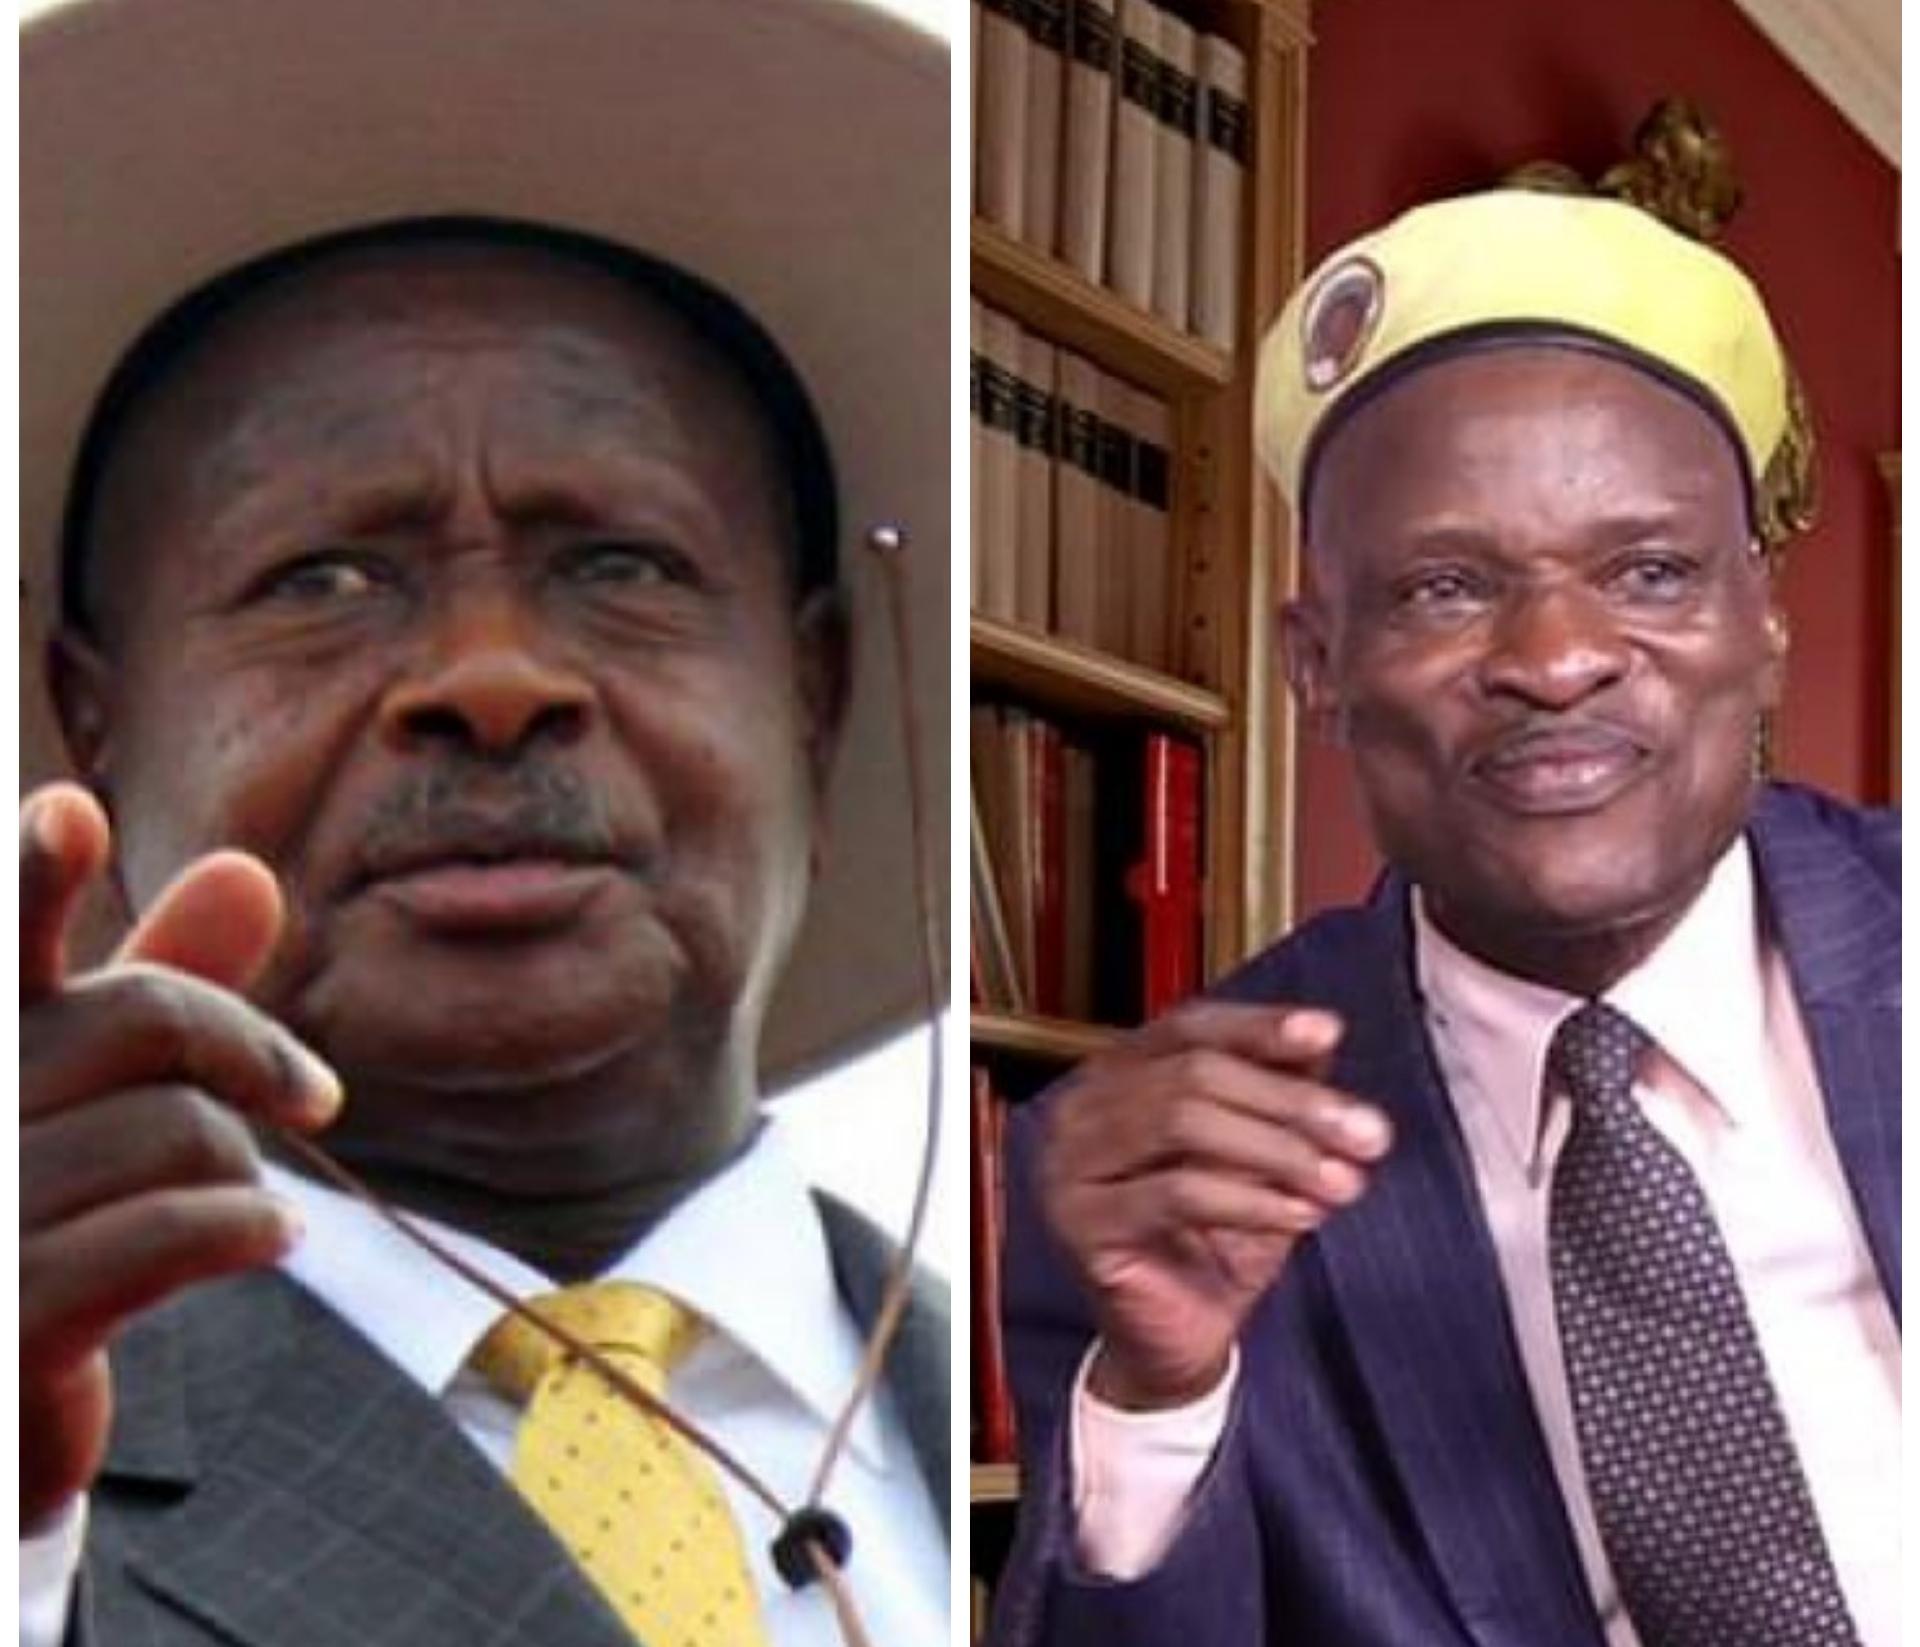 President Yoweri Museveni and Tamale Mirundi